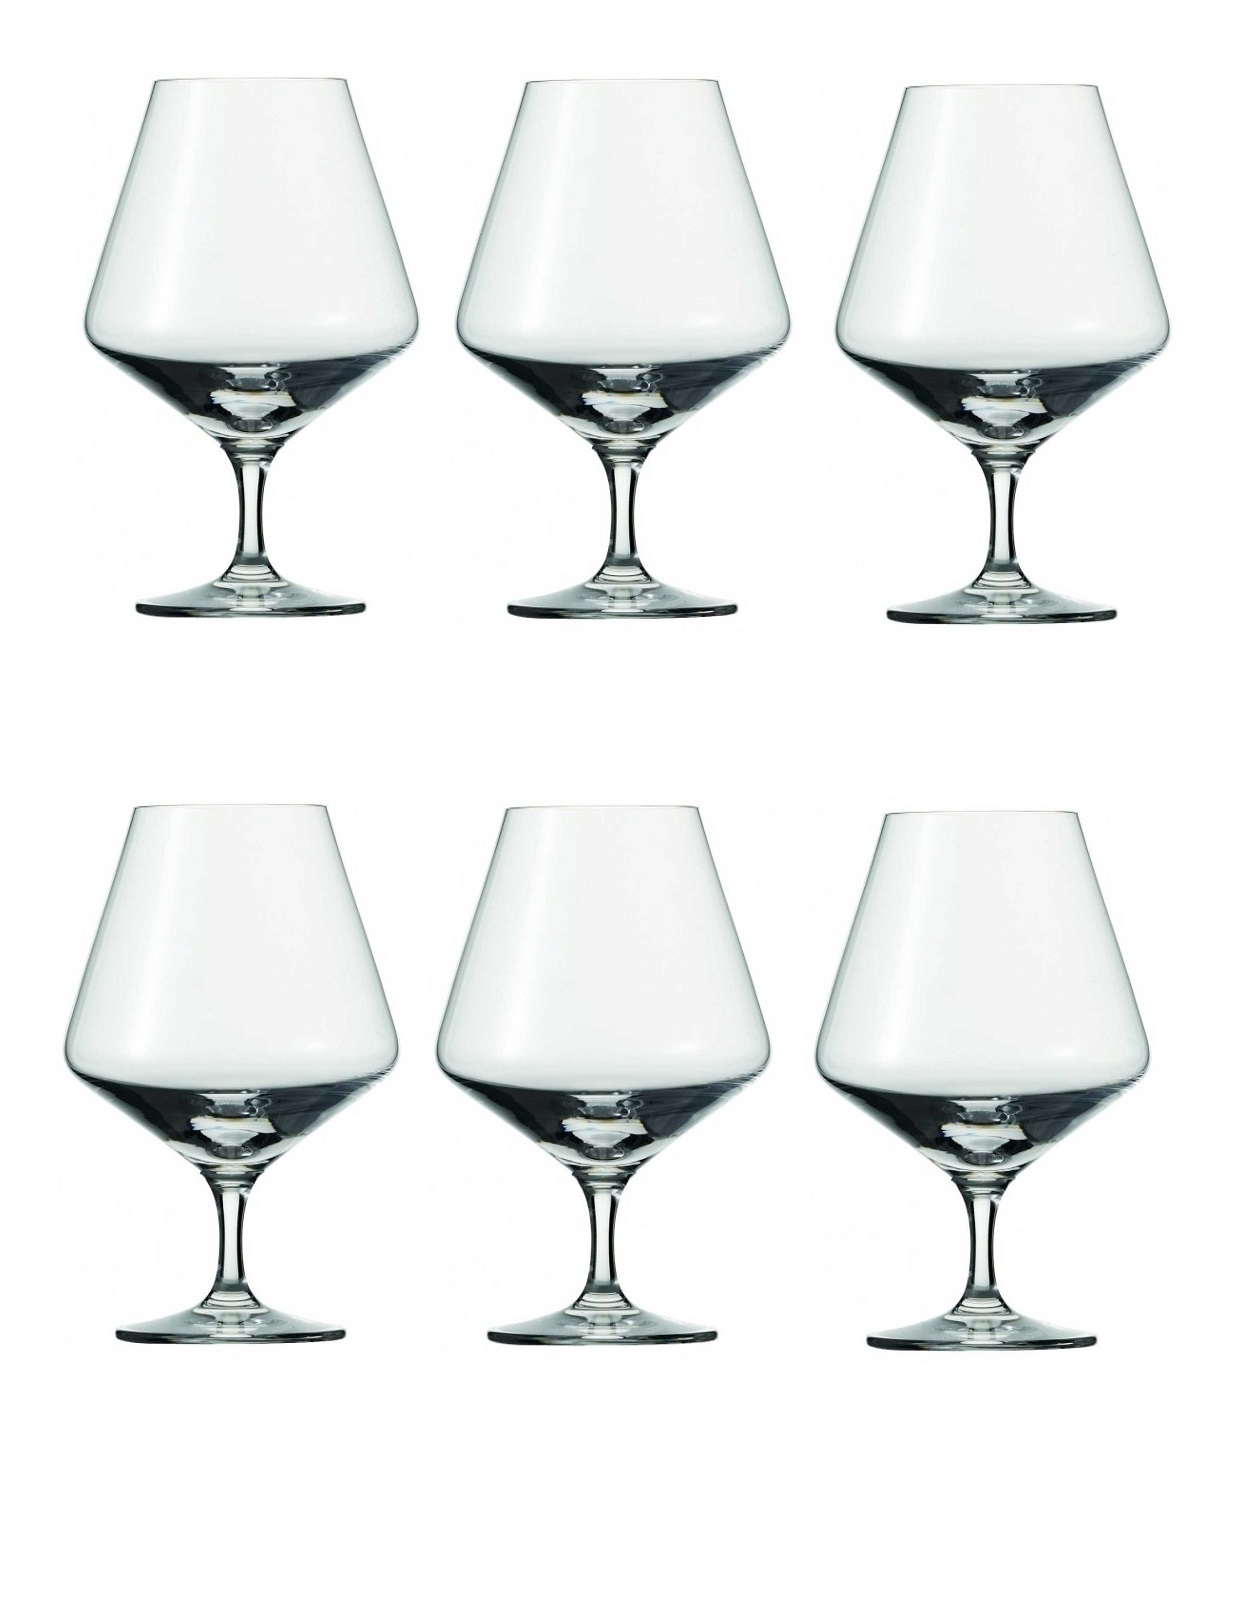 Онлайн каталог PROMENU: Набор бокалов для коньяка Schott Zwiesel PURE, объем 0,616 л, прозрачный, 6 штук Schott Zwiesel 113756_6шт